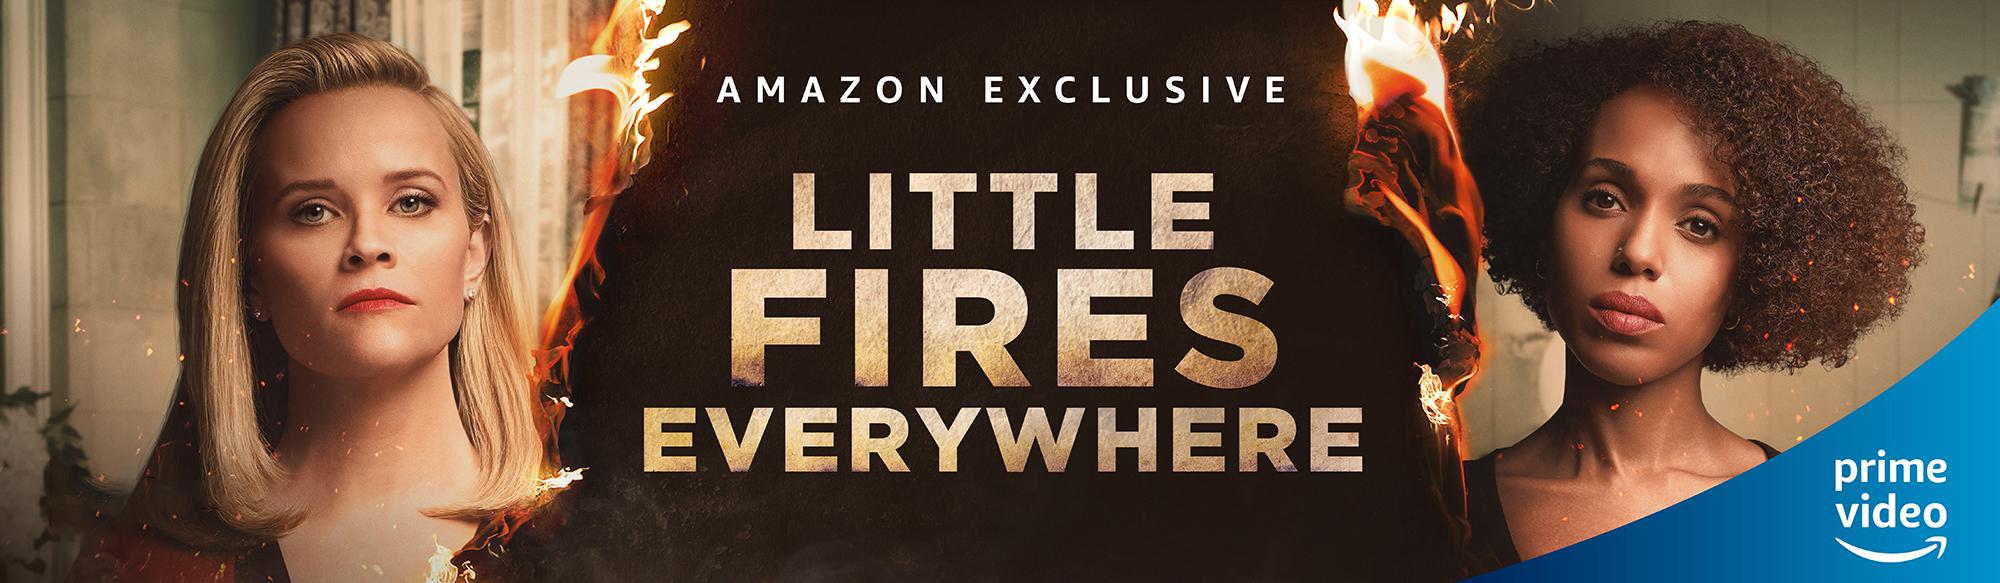 La miniserie Little Fires Everywhere llega a Amazon Prime Video